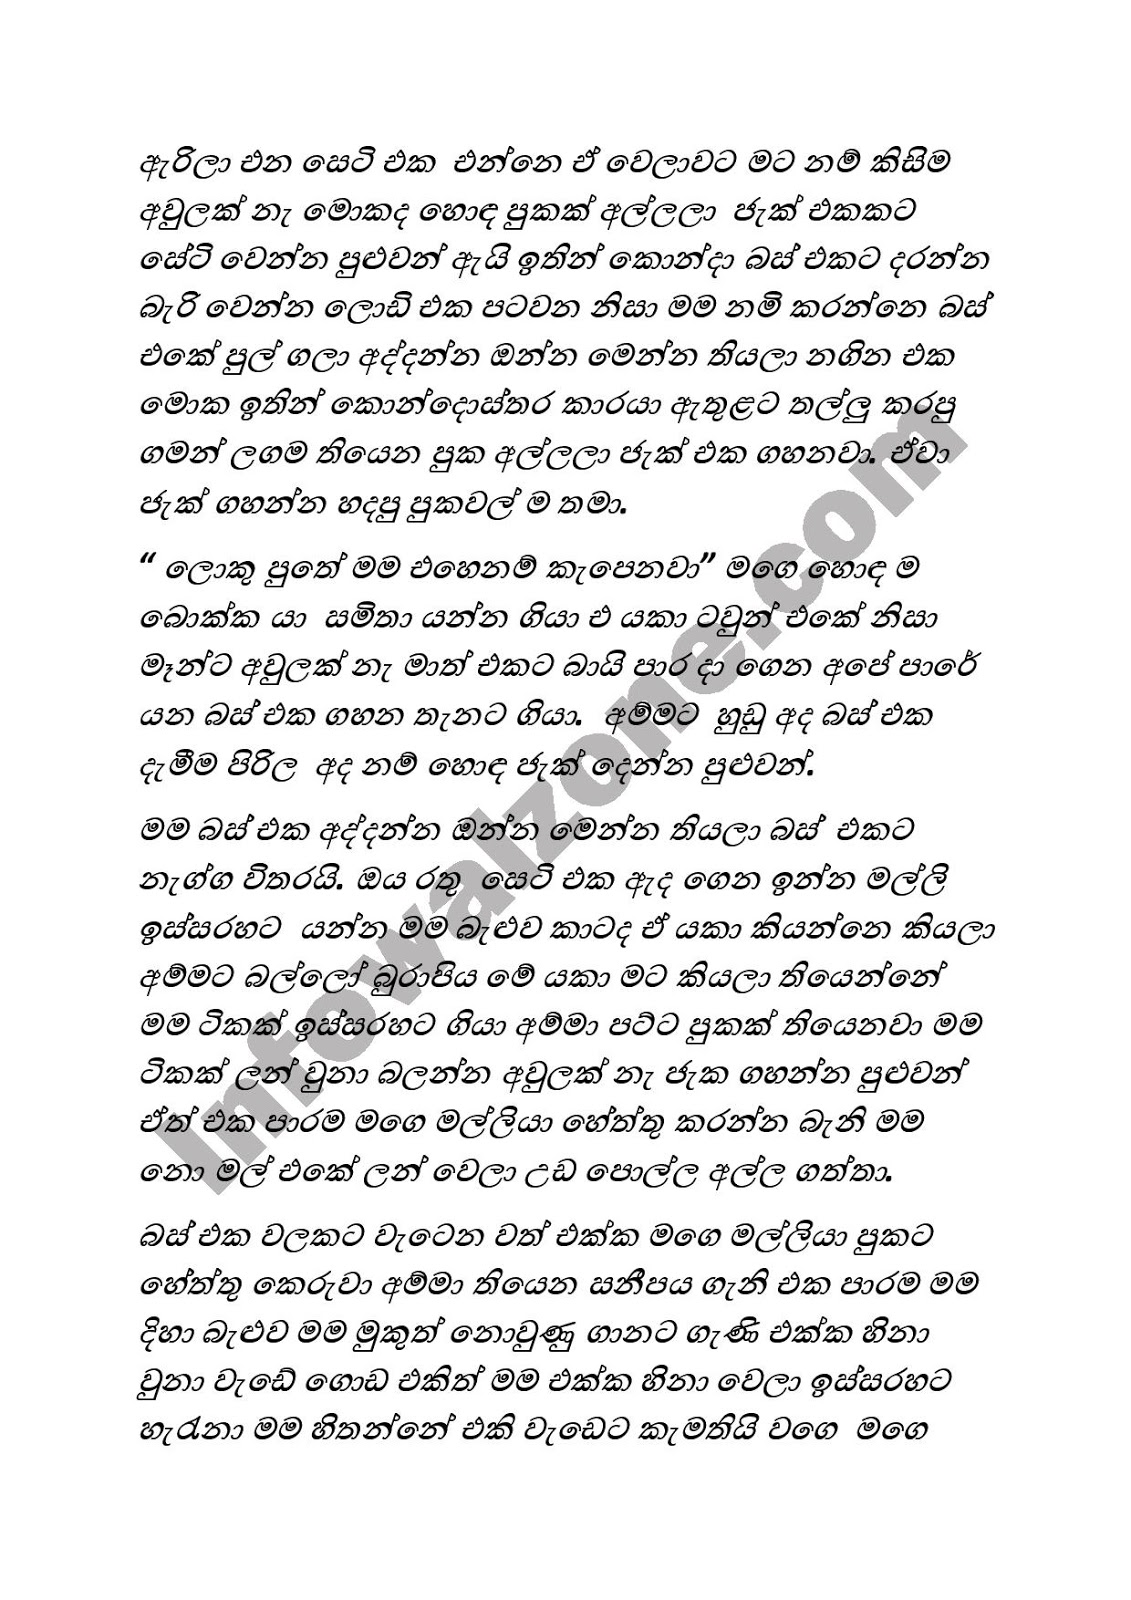 Hitha Giyathana Maligawa 1 - Sinhala Wal Katha